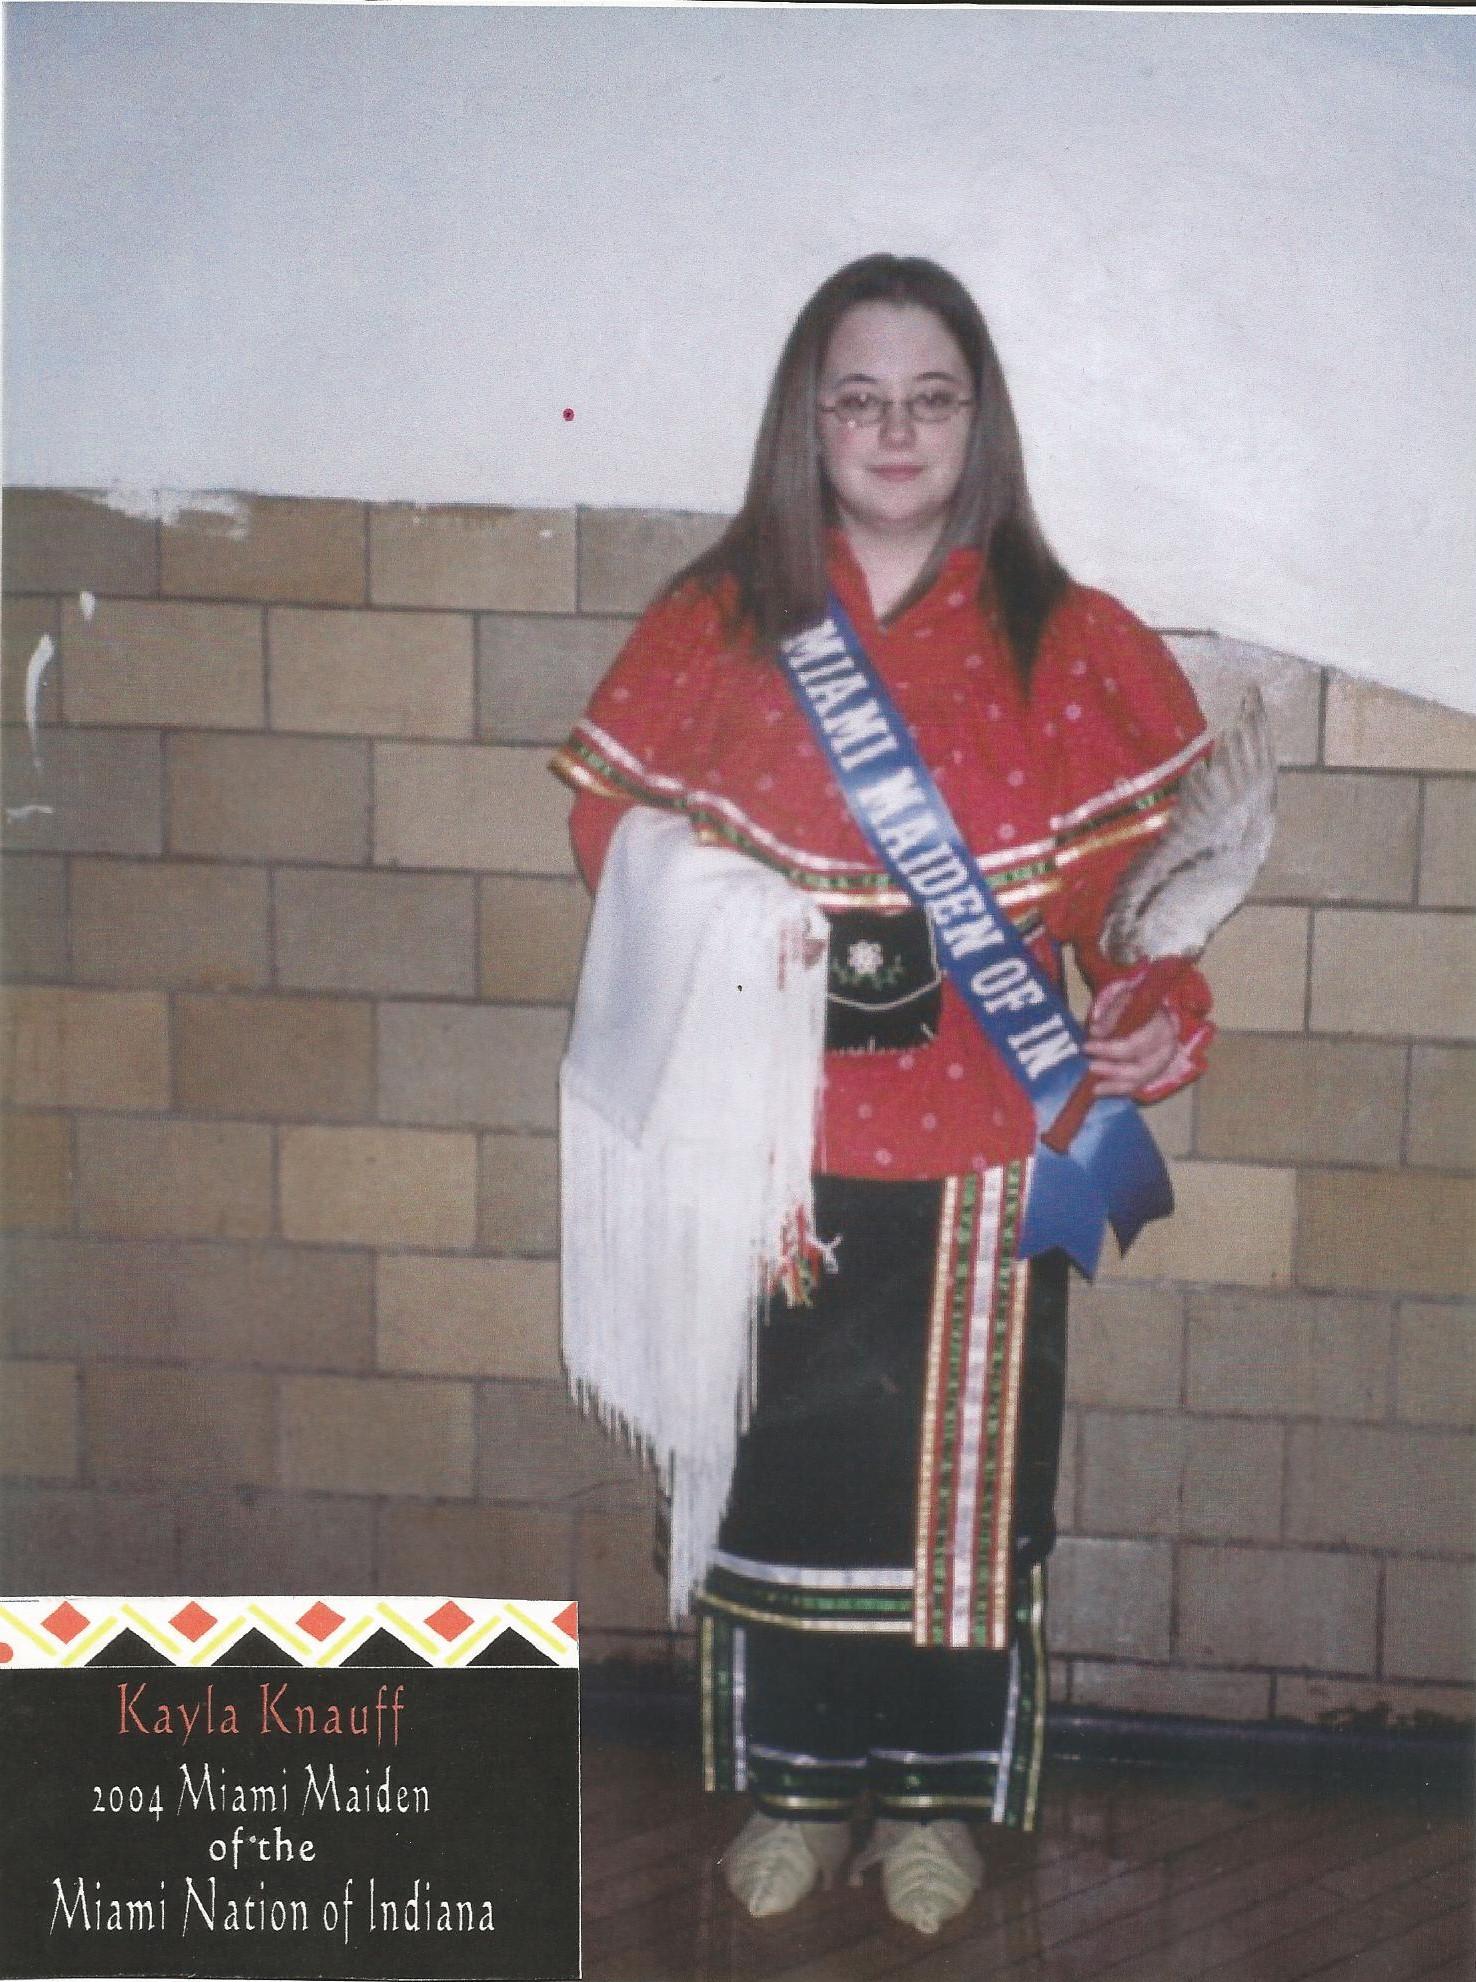 Miss Kayla Knauff - Miss Miami Maiden 2004